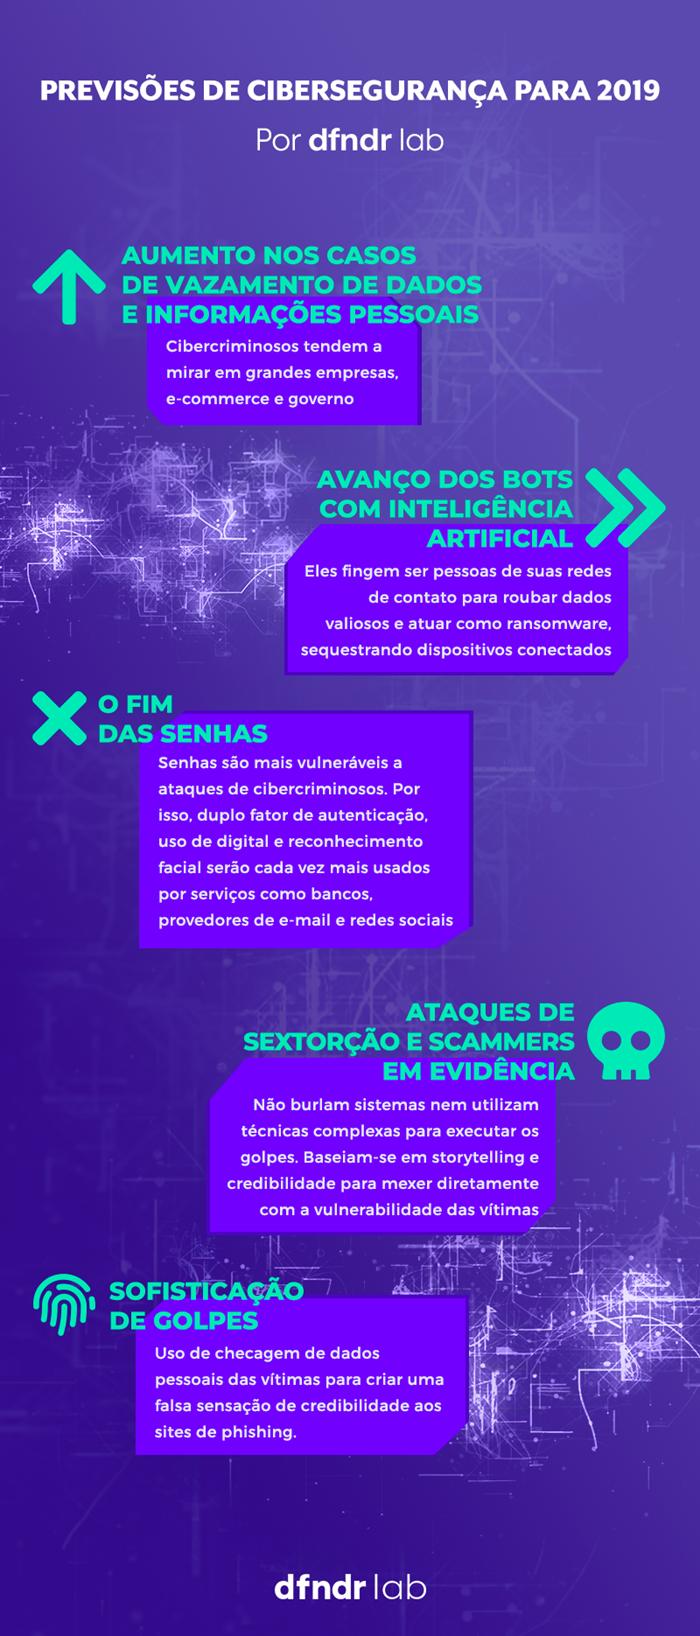 ciberseguranca-2019